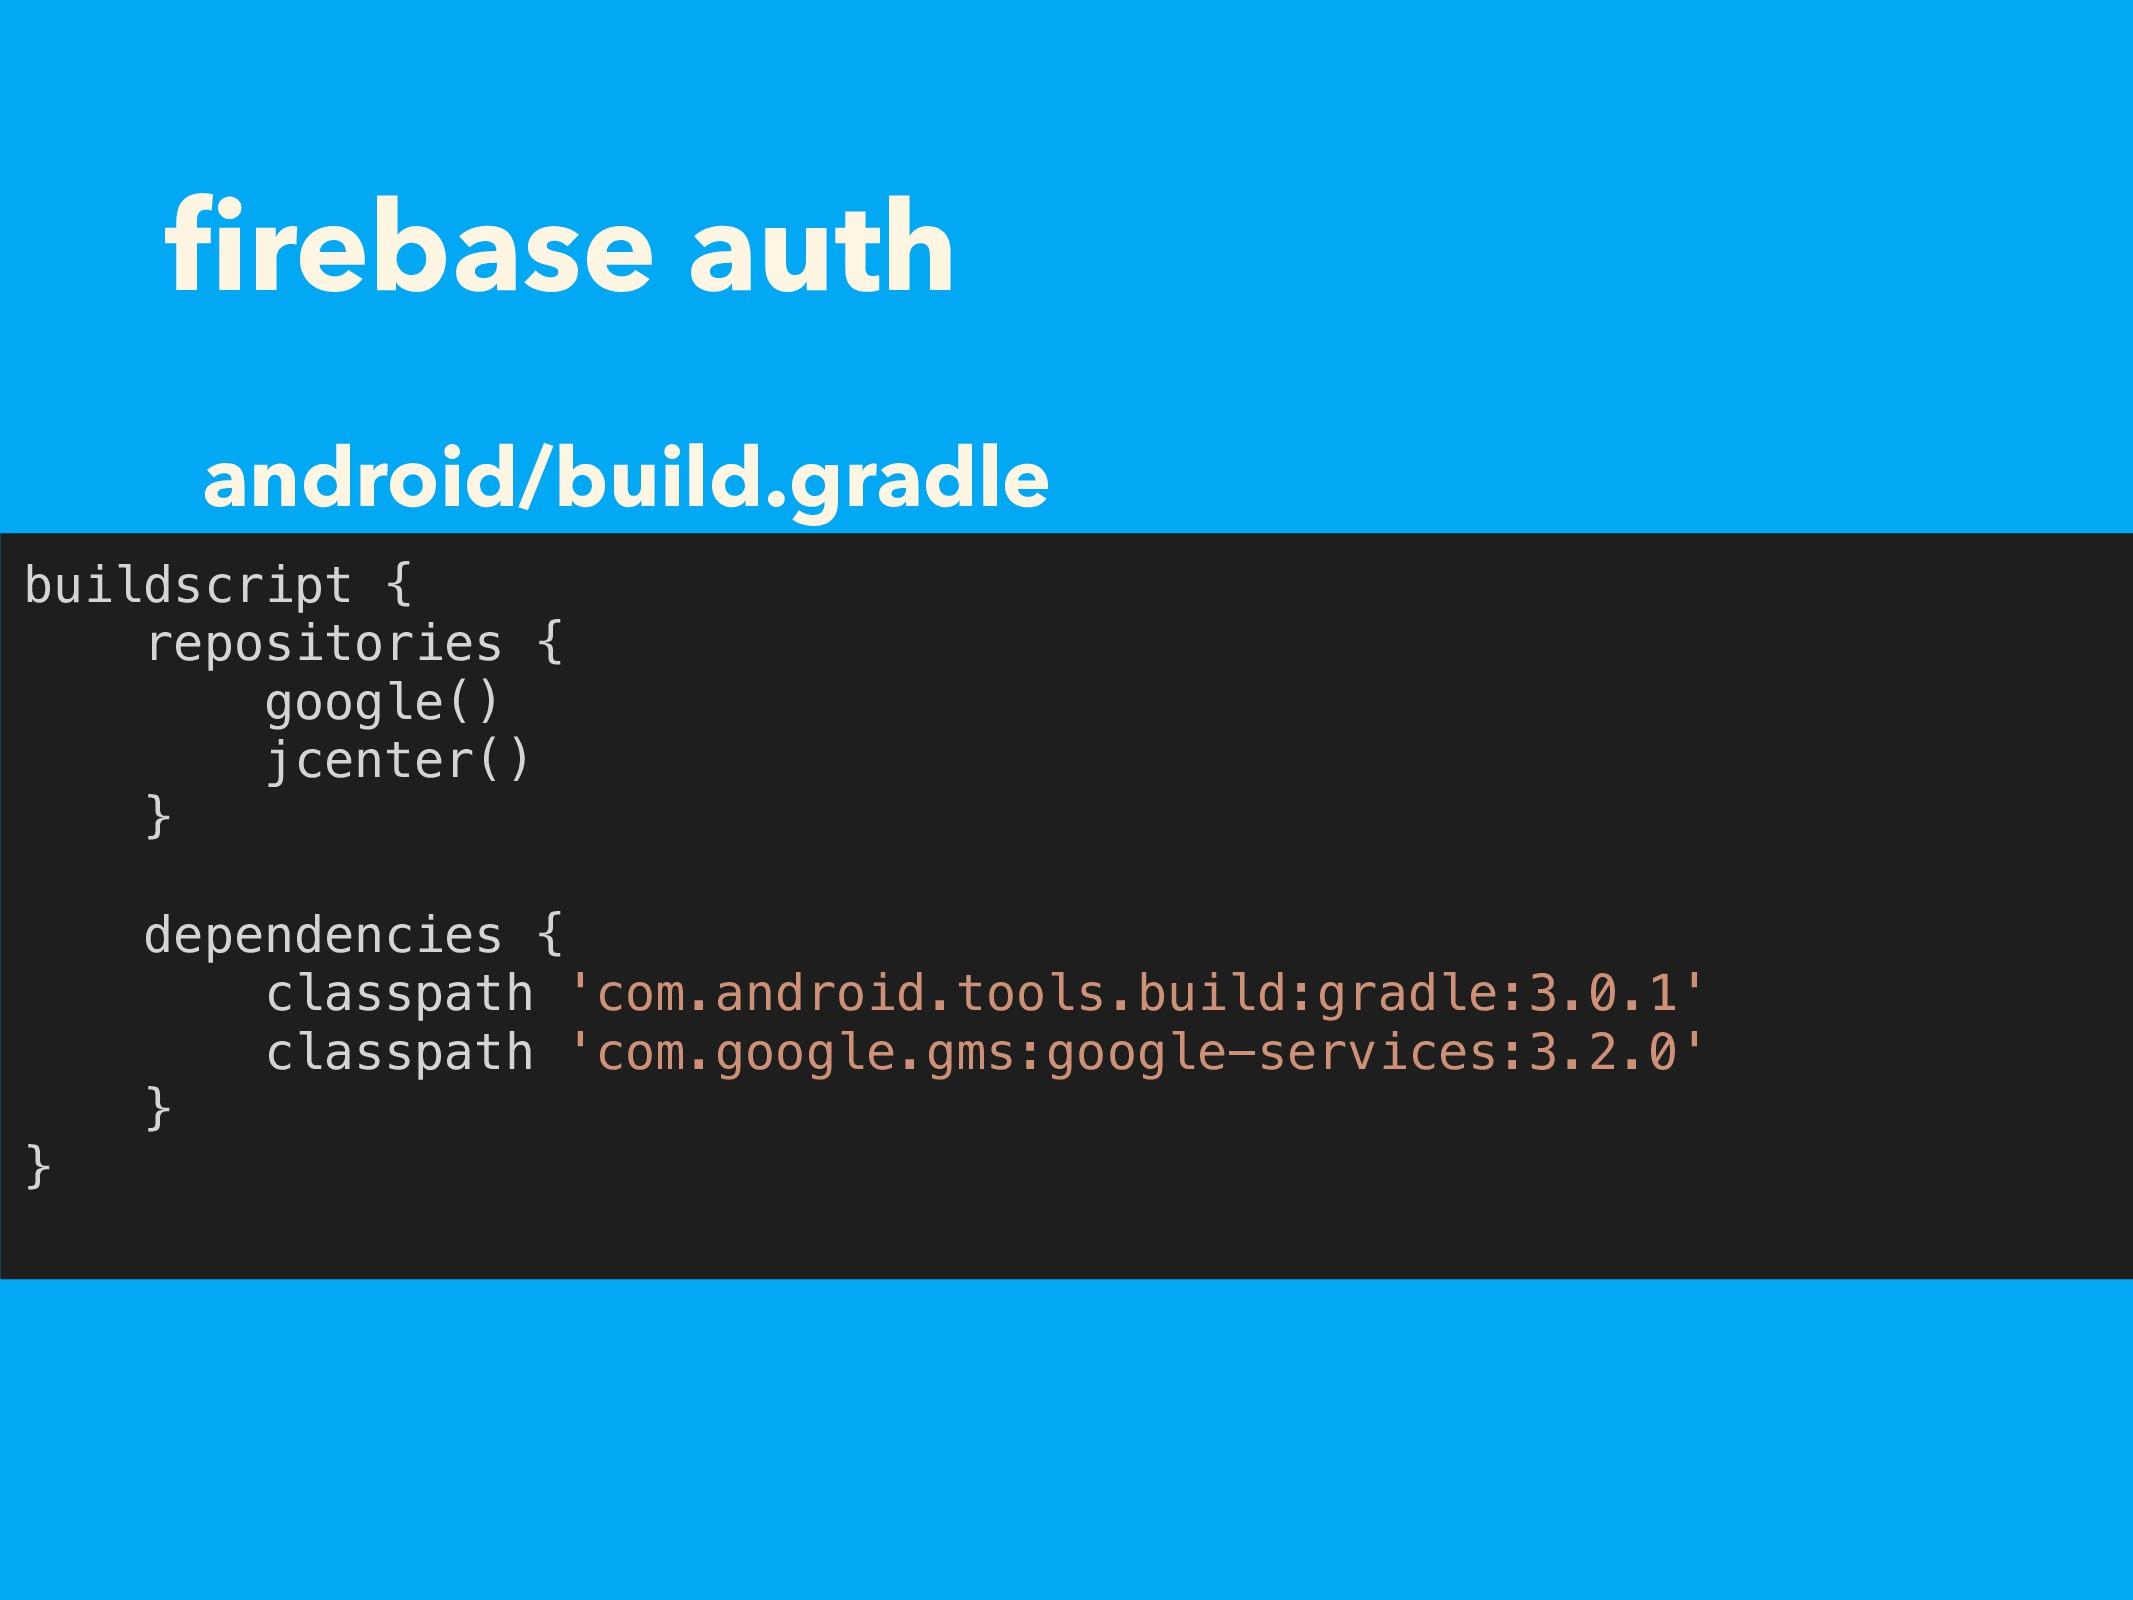 firebase auth buildscript { repositories { googl...